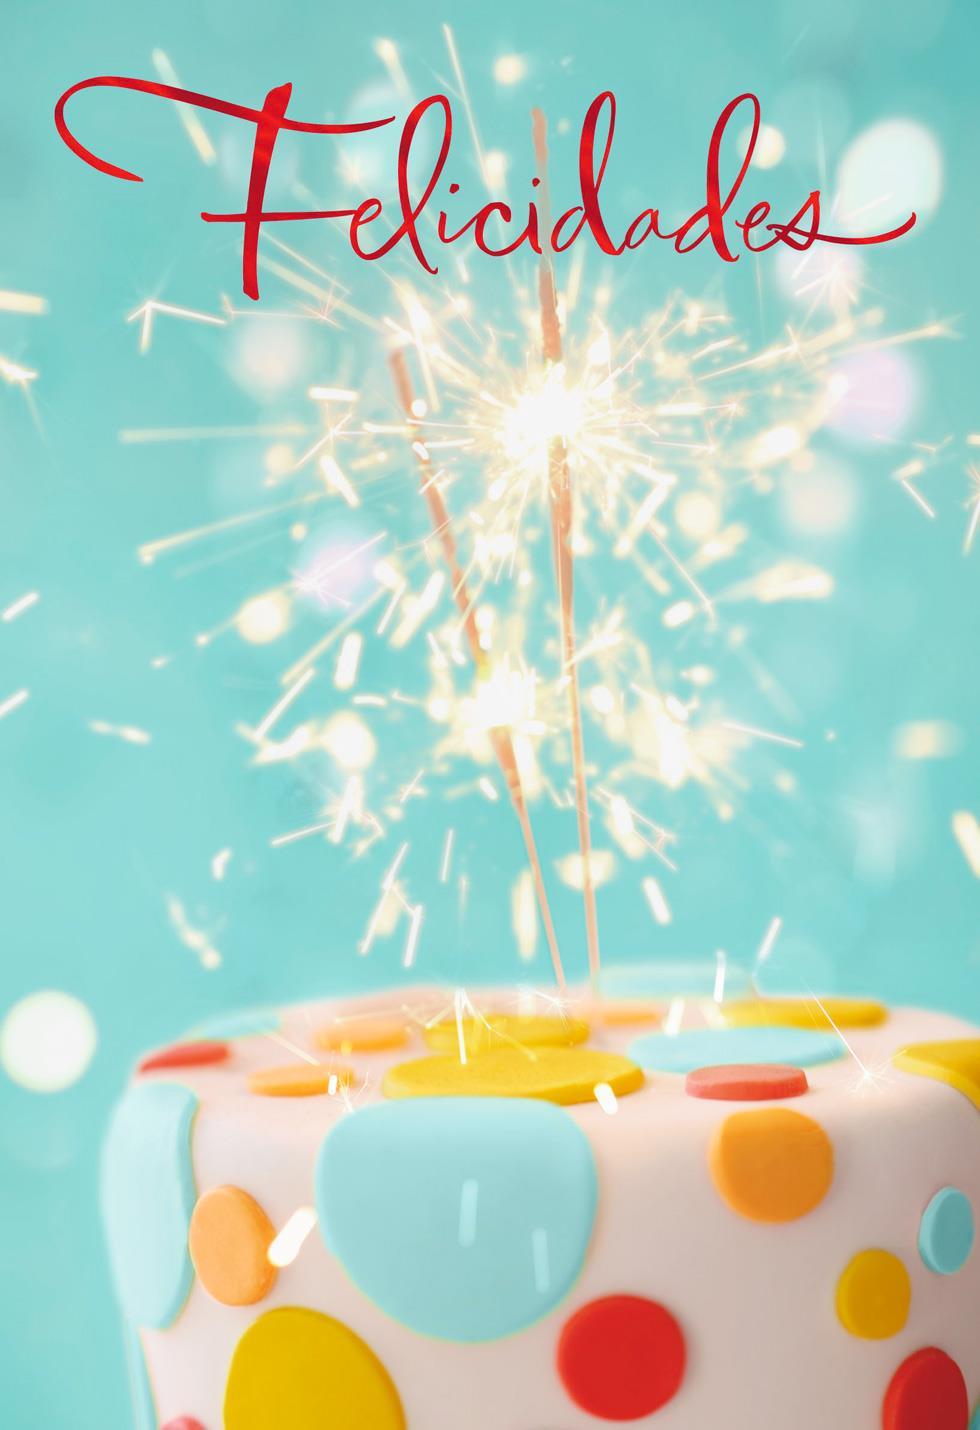 Sparkler Cupcake Spanish Language Birthday Card Greeting